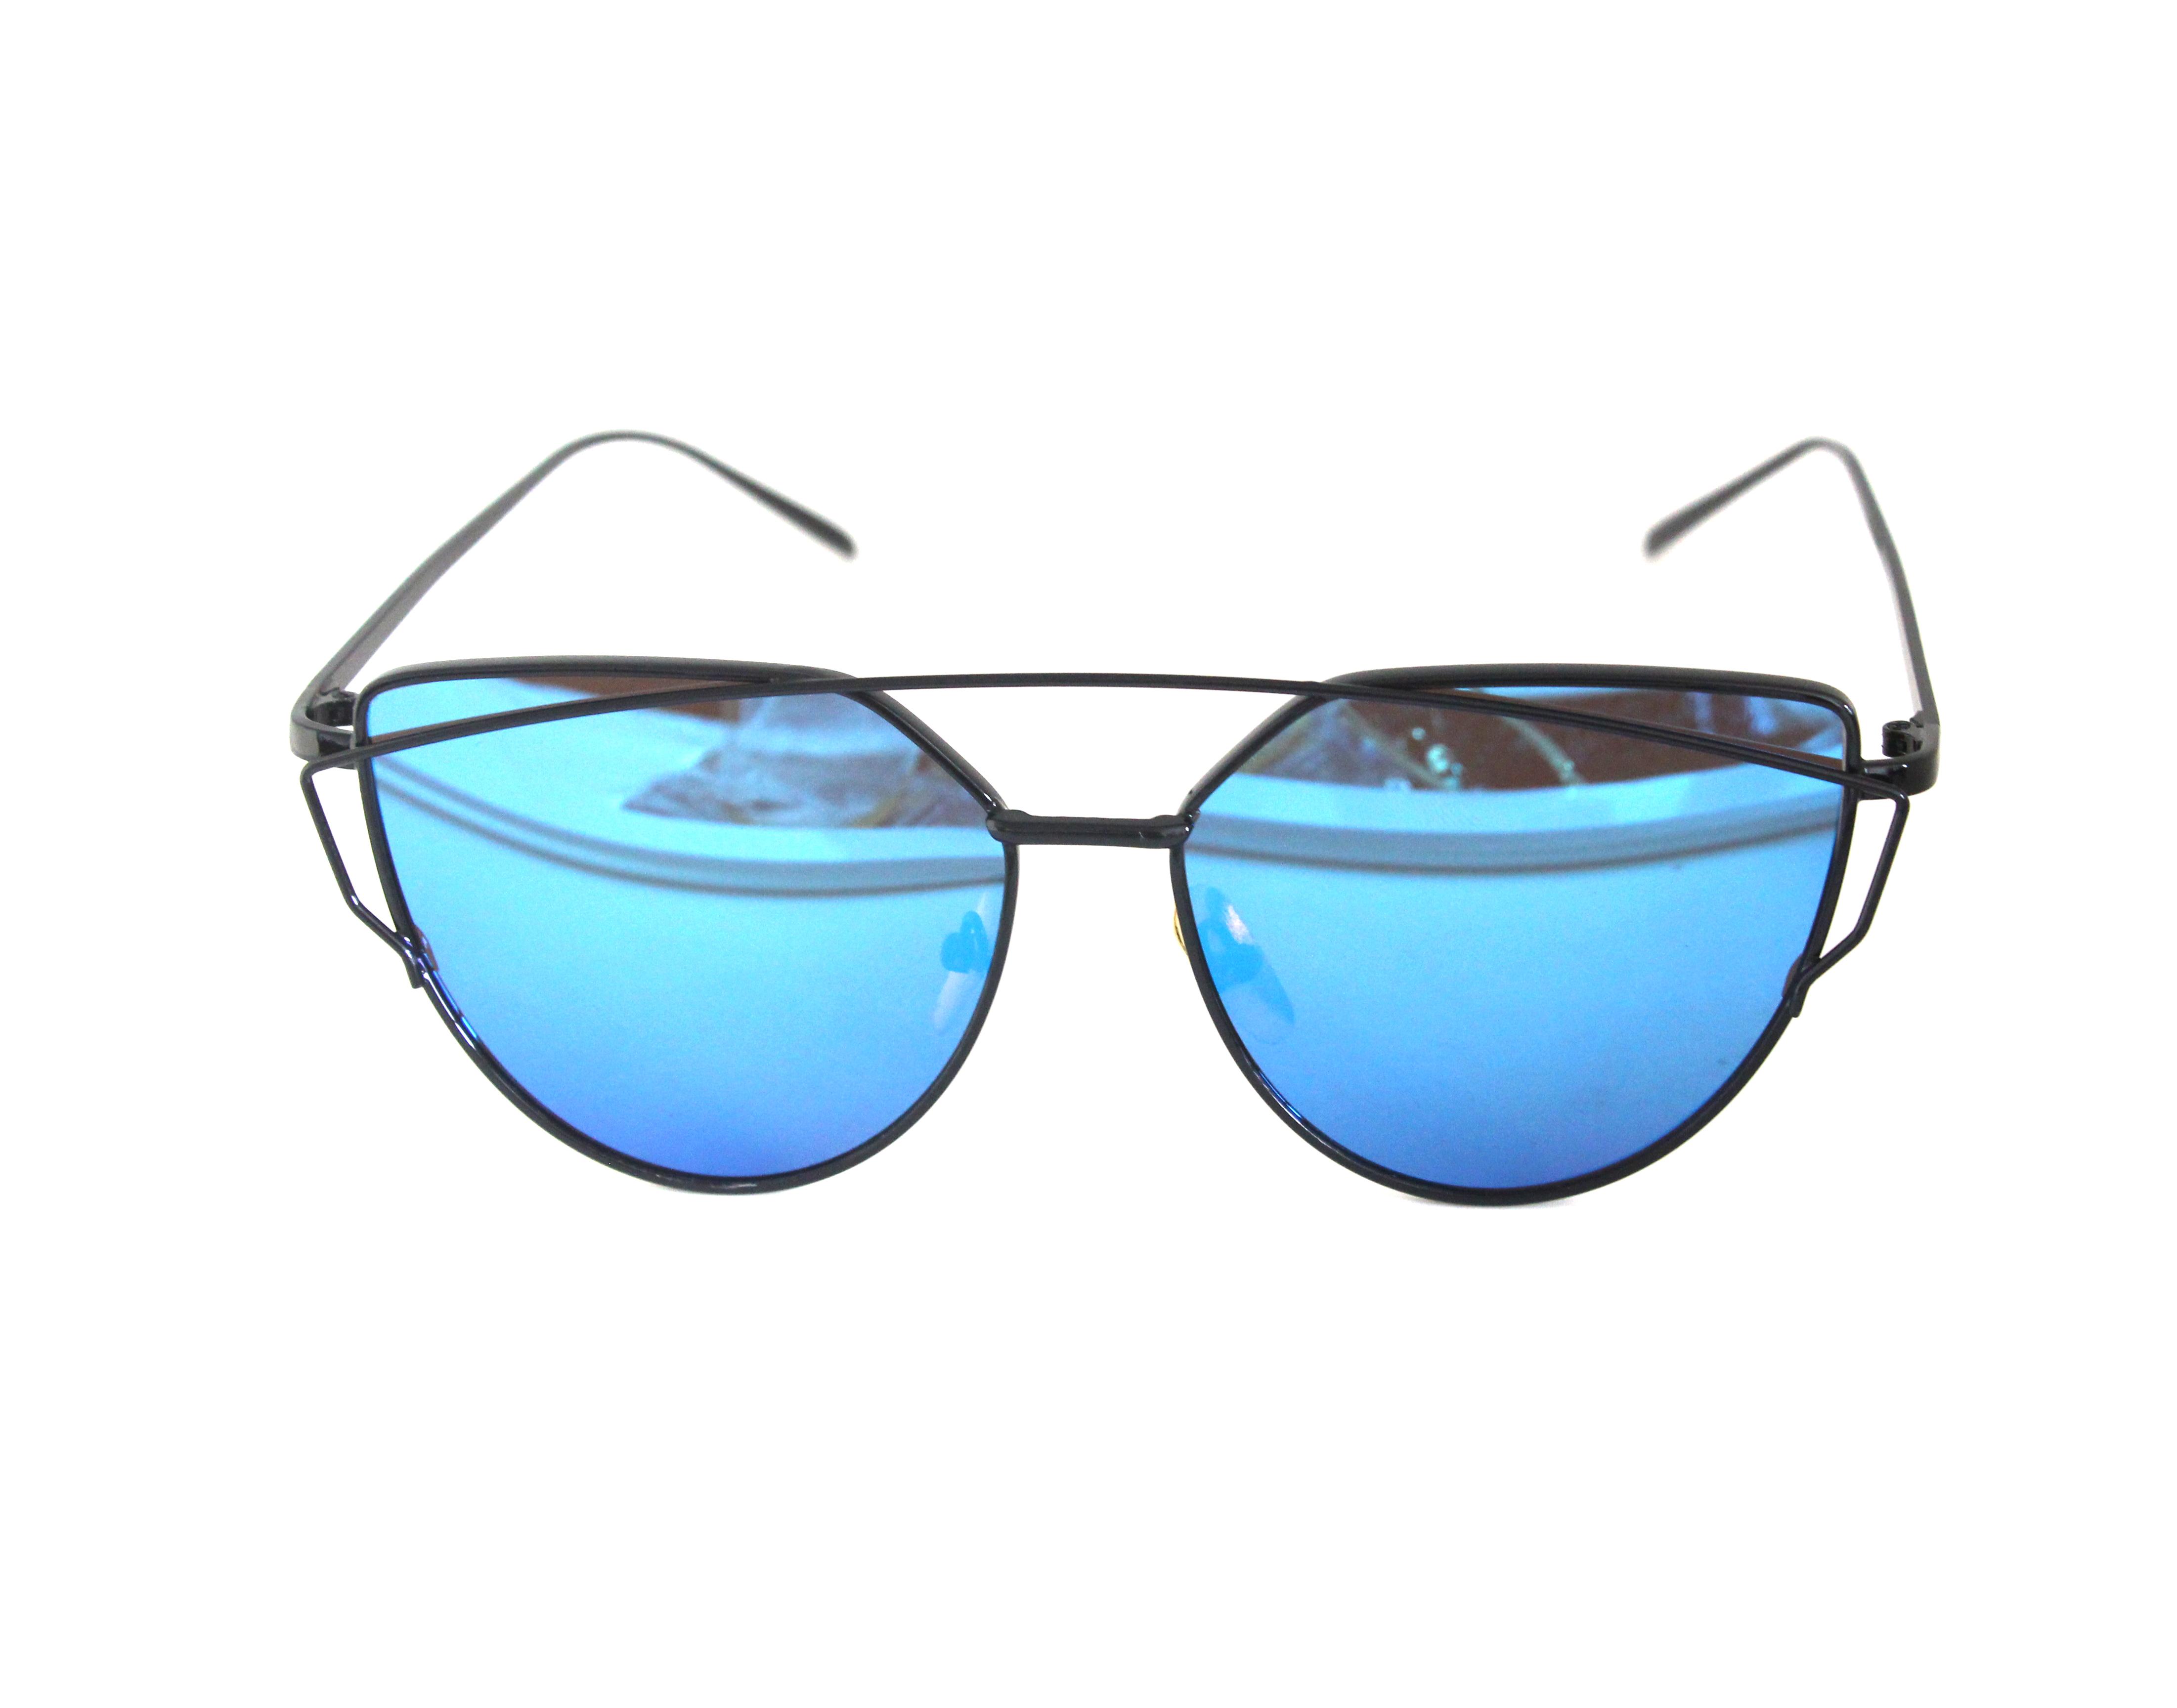 573ba0022b1 Fashion Women Cat Eye Sunglasses Classic Brand Designer Twin-Beams  Sunglasses